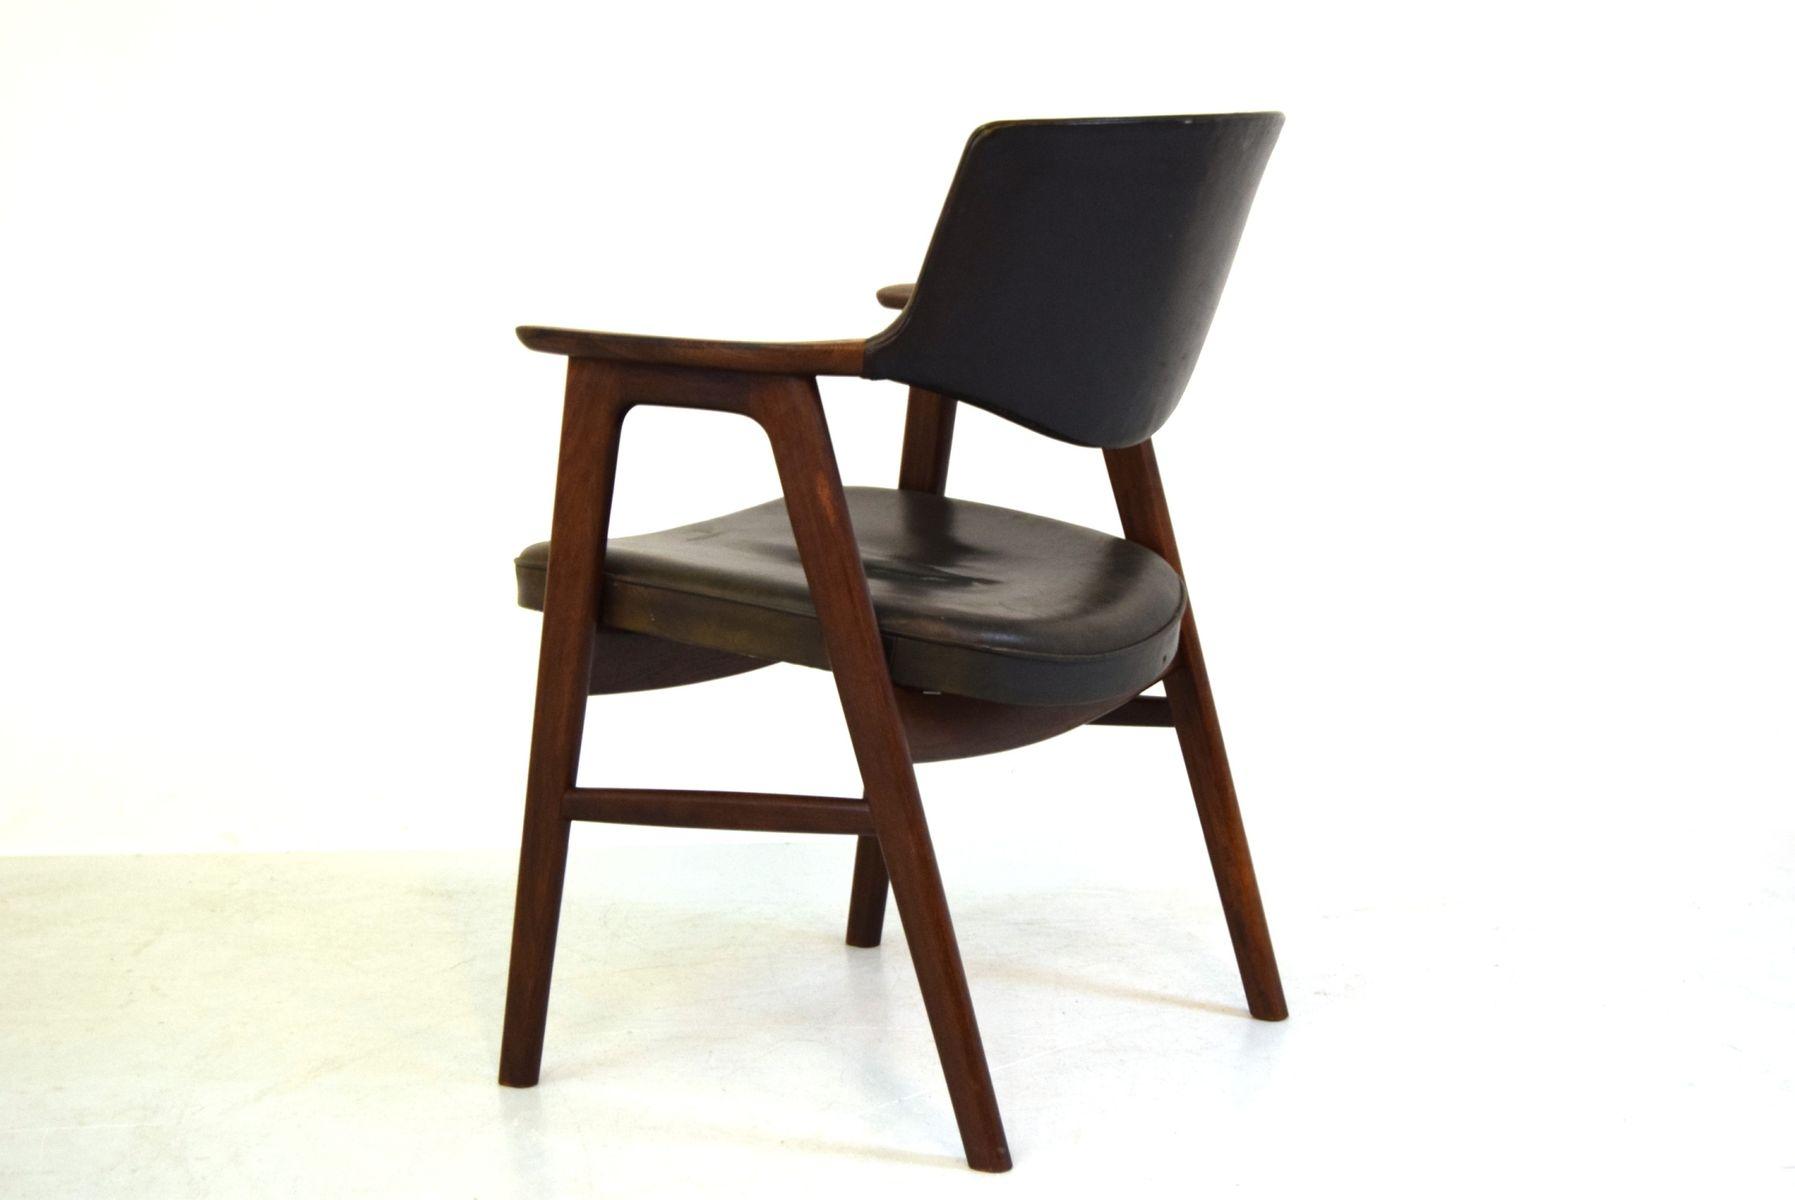 Danish Dining Chair by Erik Kierkegaard for H248ng  : danish dining chair by erik kierkegaard for hong stolefabrik 5 from www.pamono.com size 1795 x 1200 jpeg 62kB